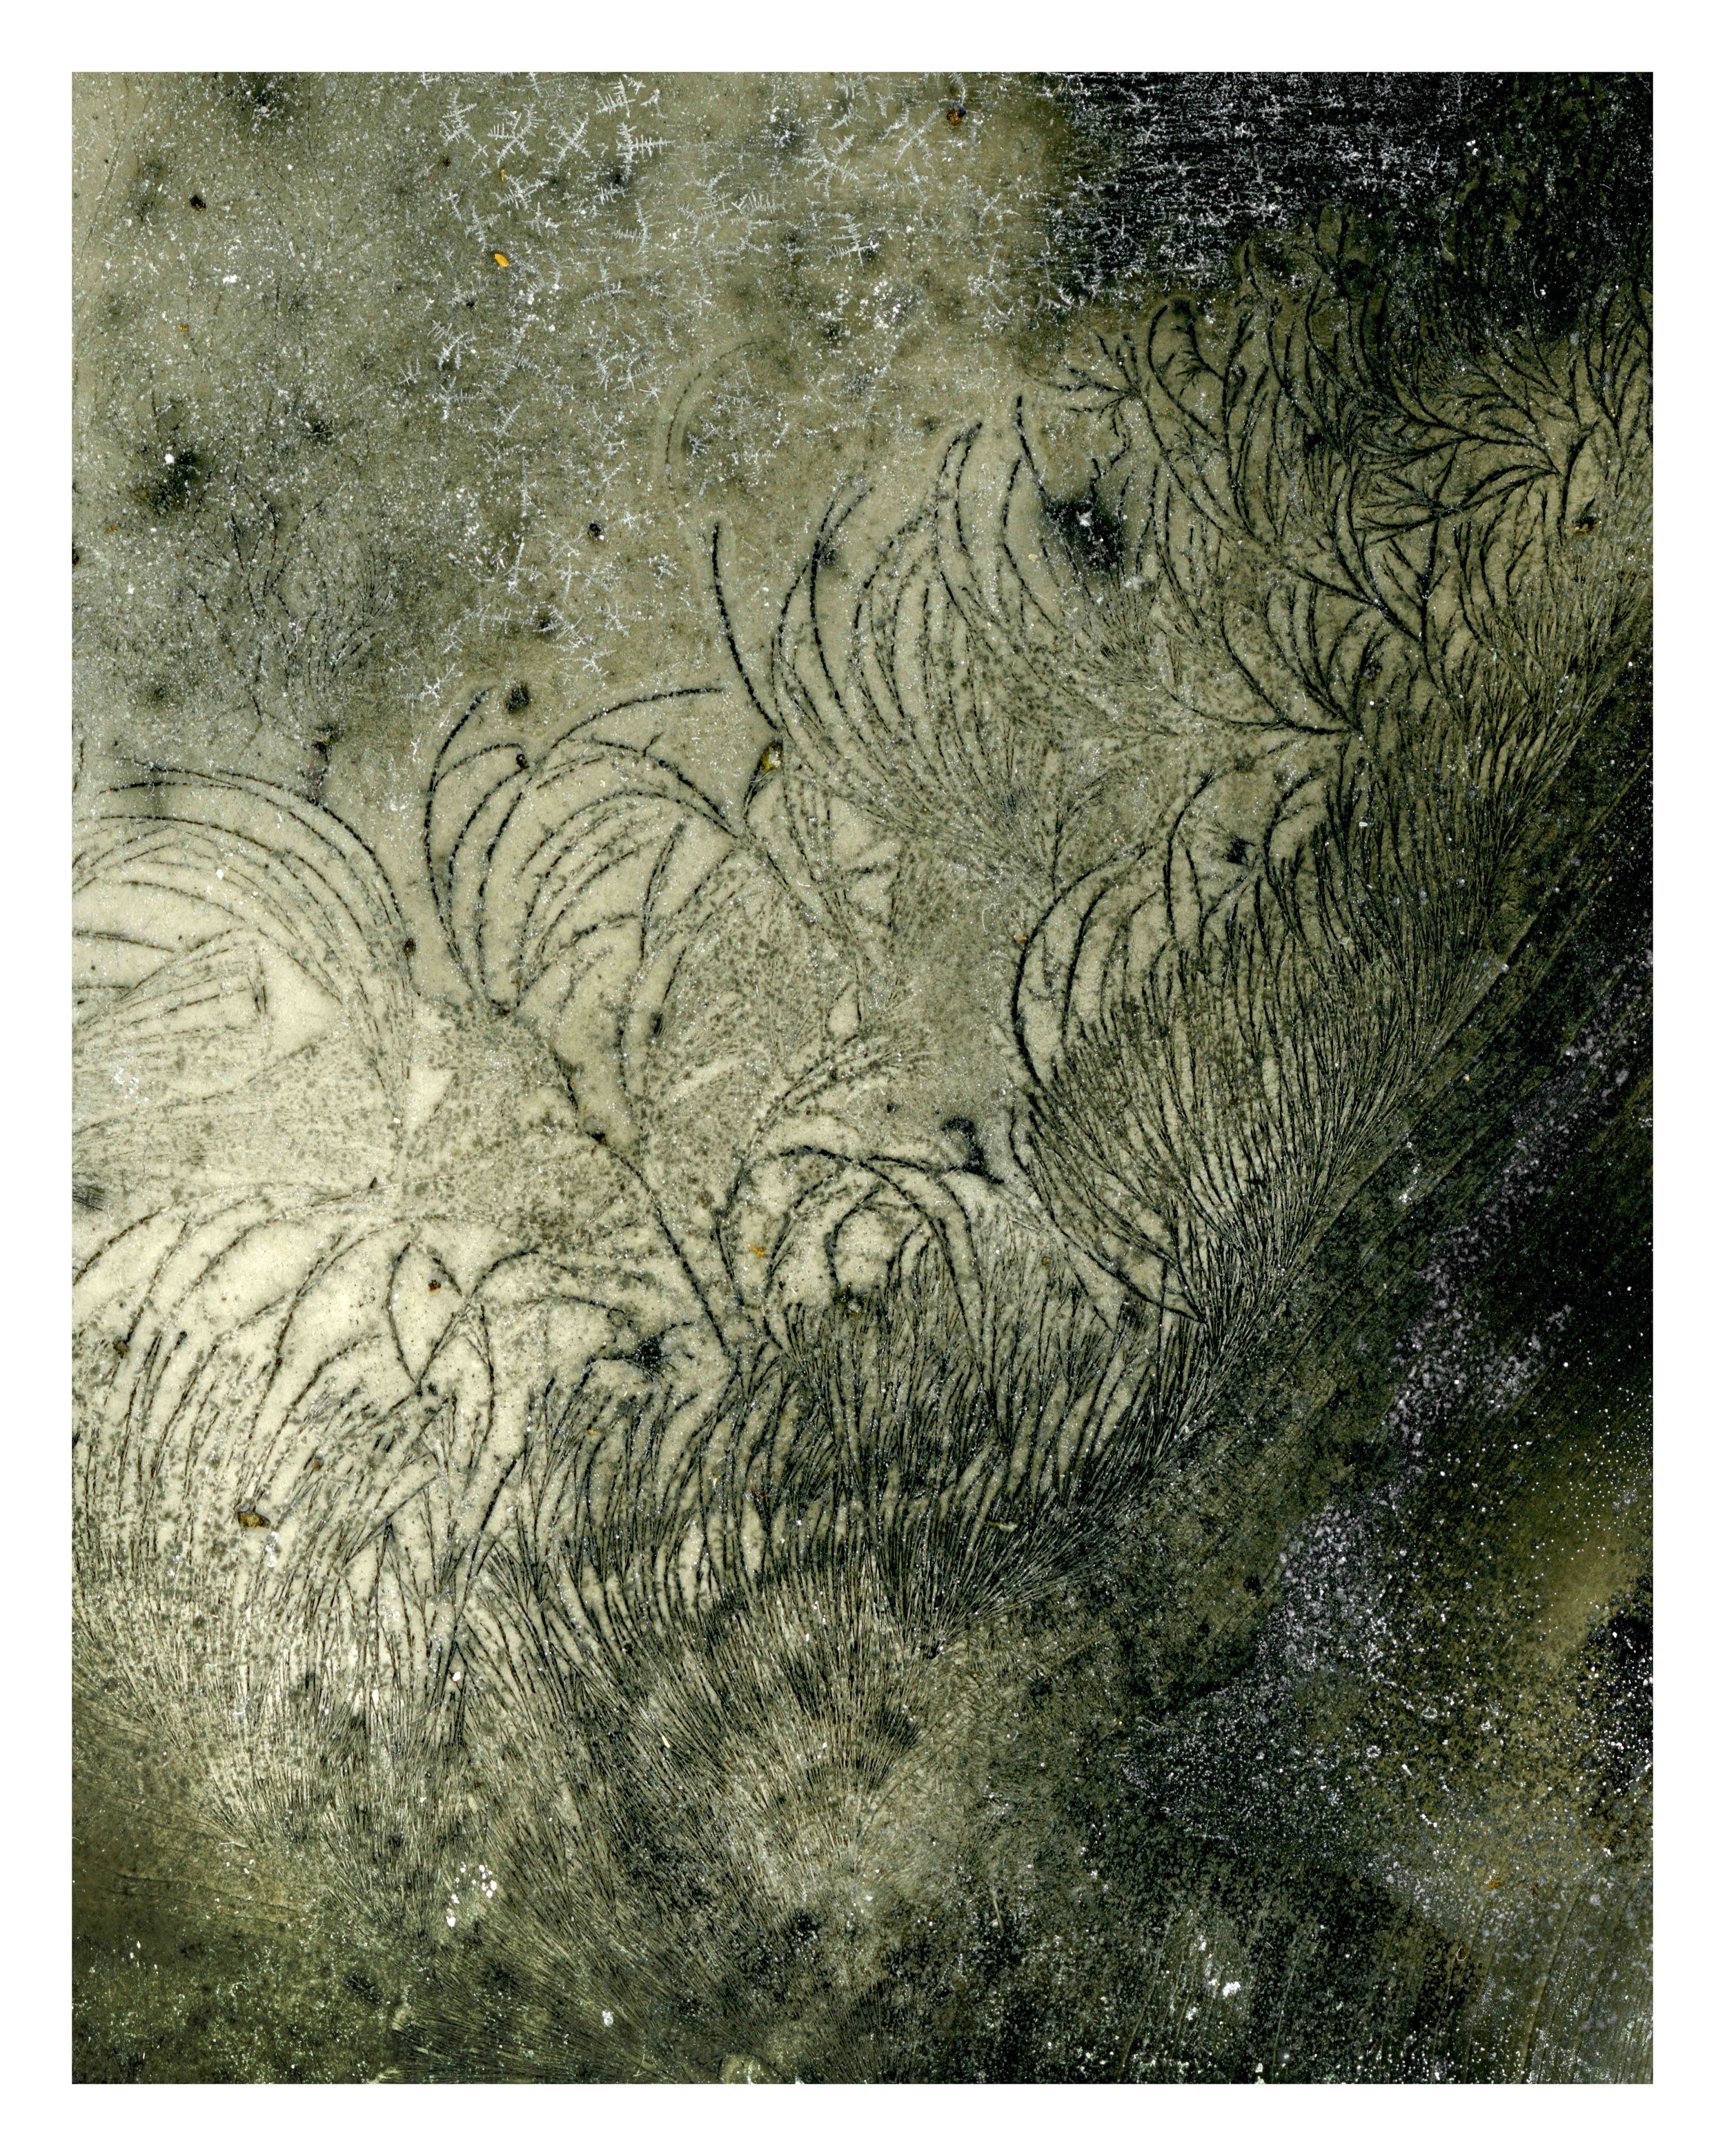 Moonlight Lush - 80 x 100 cm.jpg